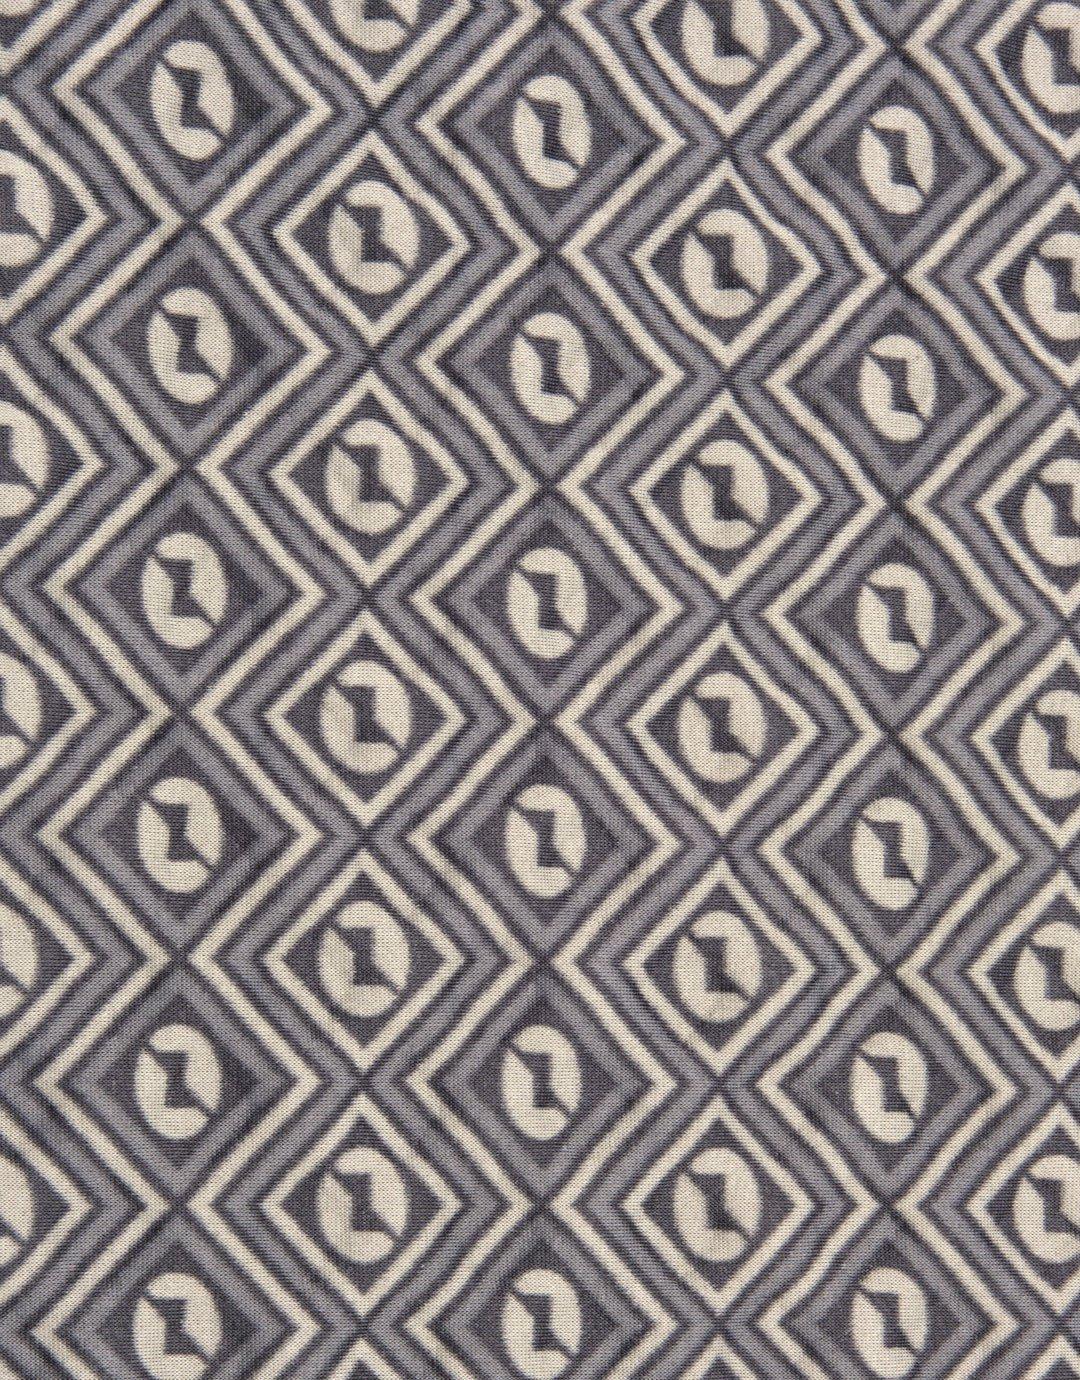 Outwell Erwachsene Inlayzzz 120X200 cm Zeltteppich, Grau, One Größe